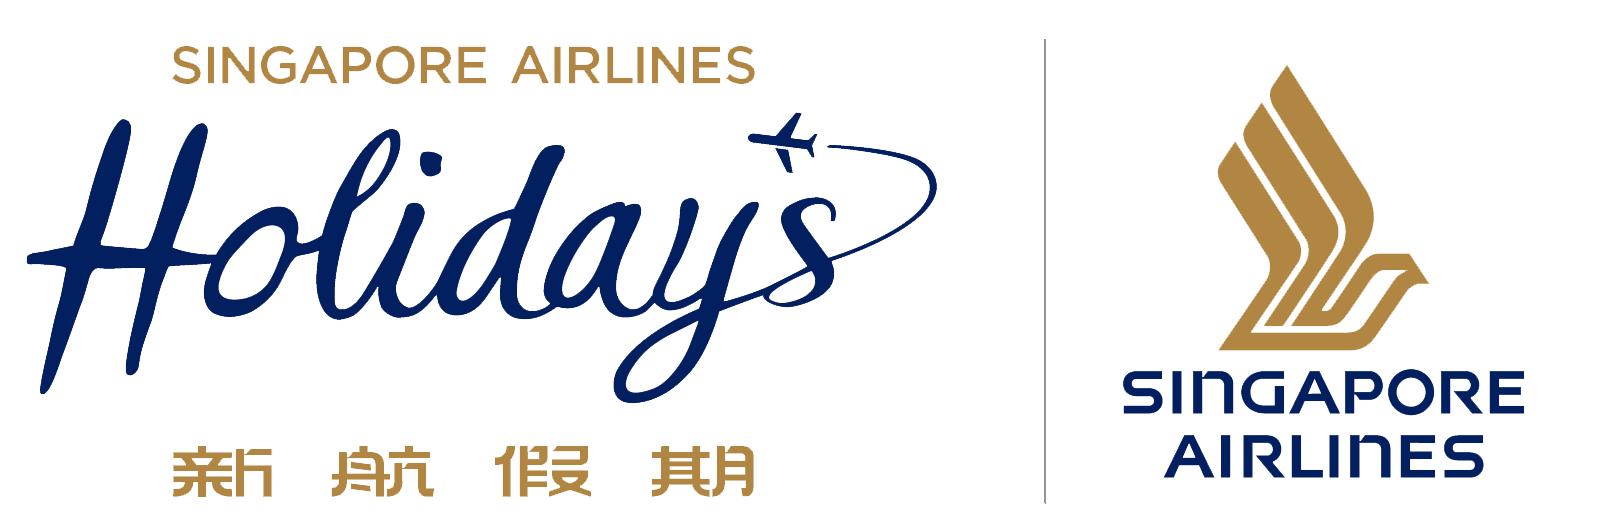 Singapore_airlines_holidays_logo